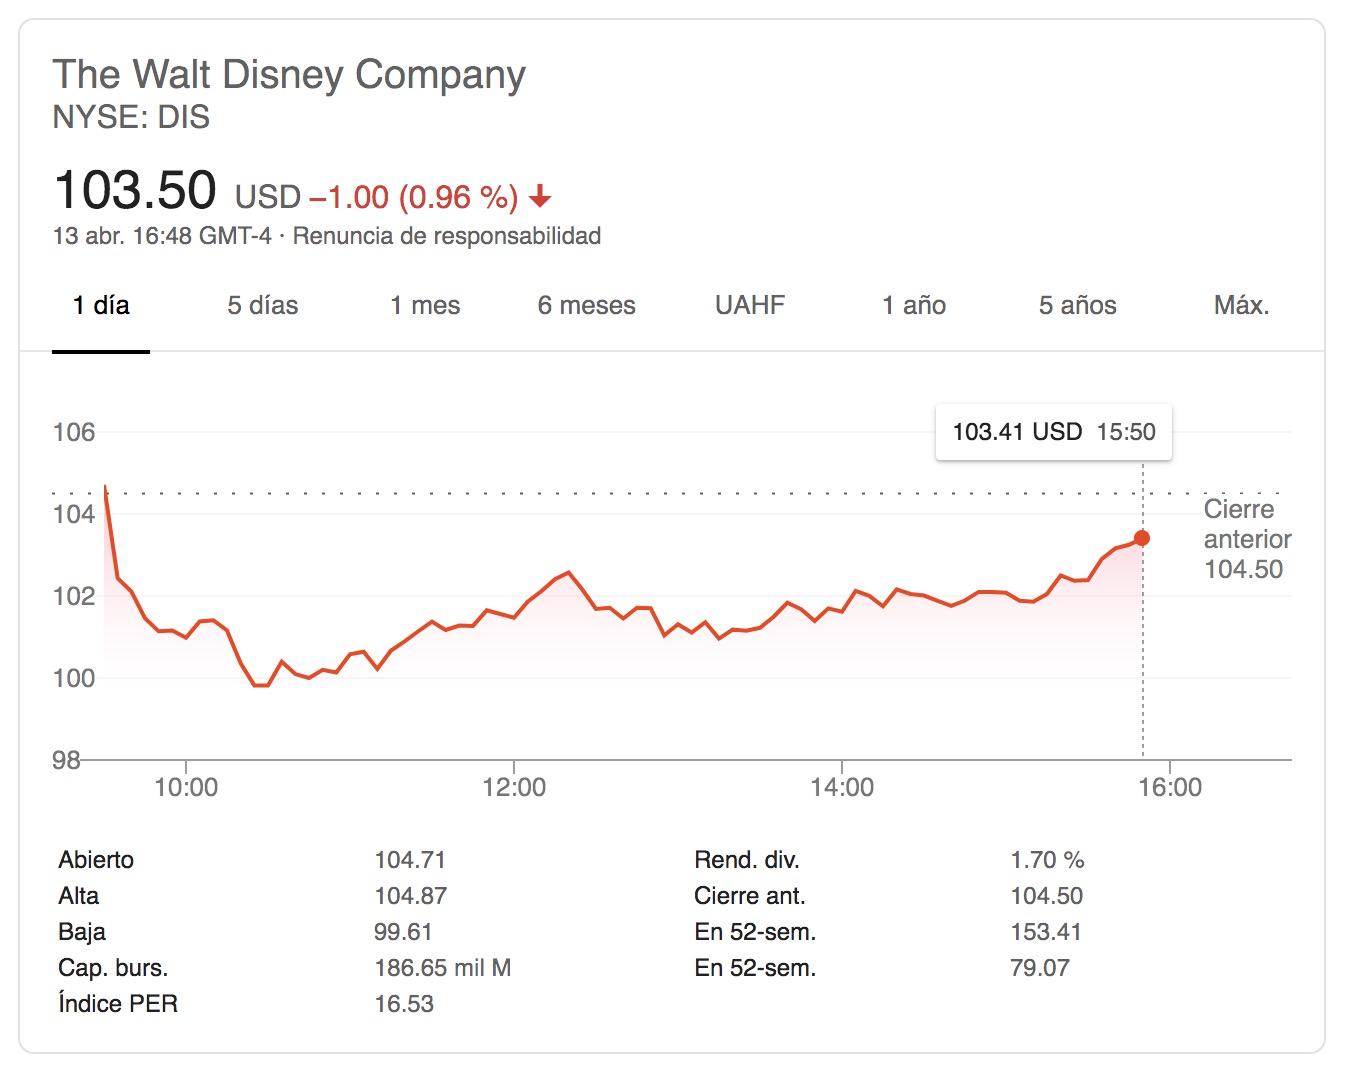 Disney-Google Finance